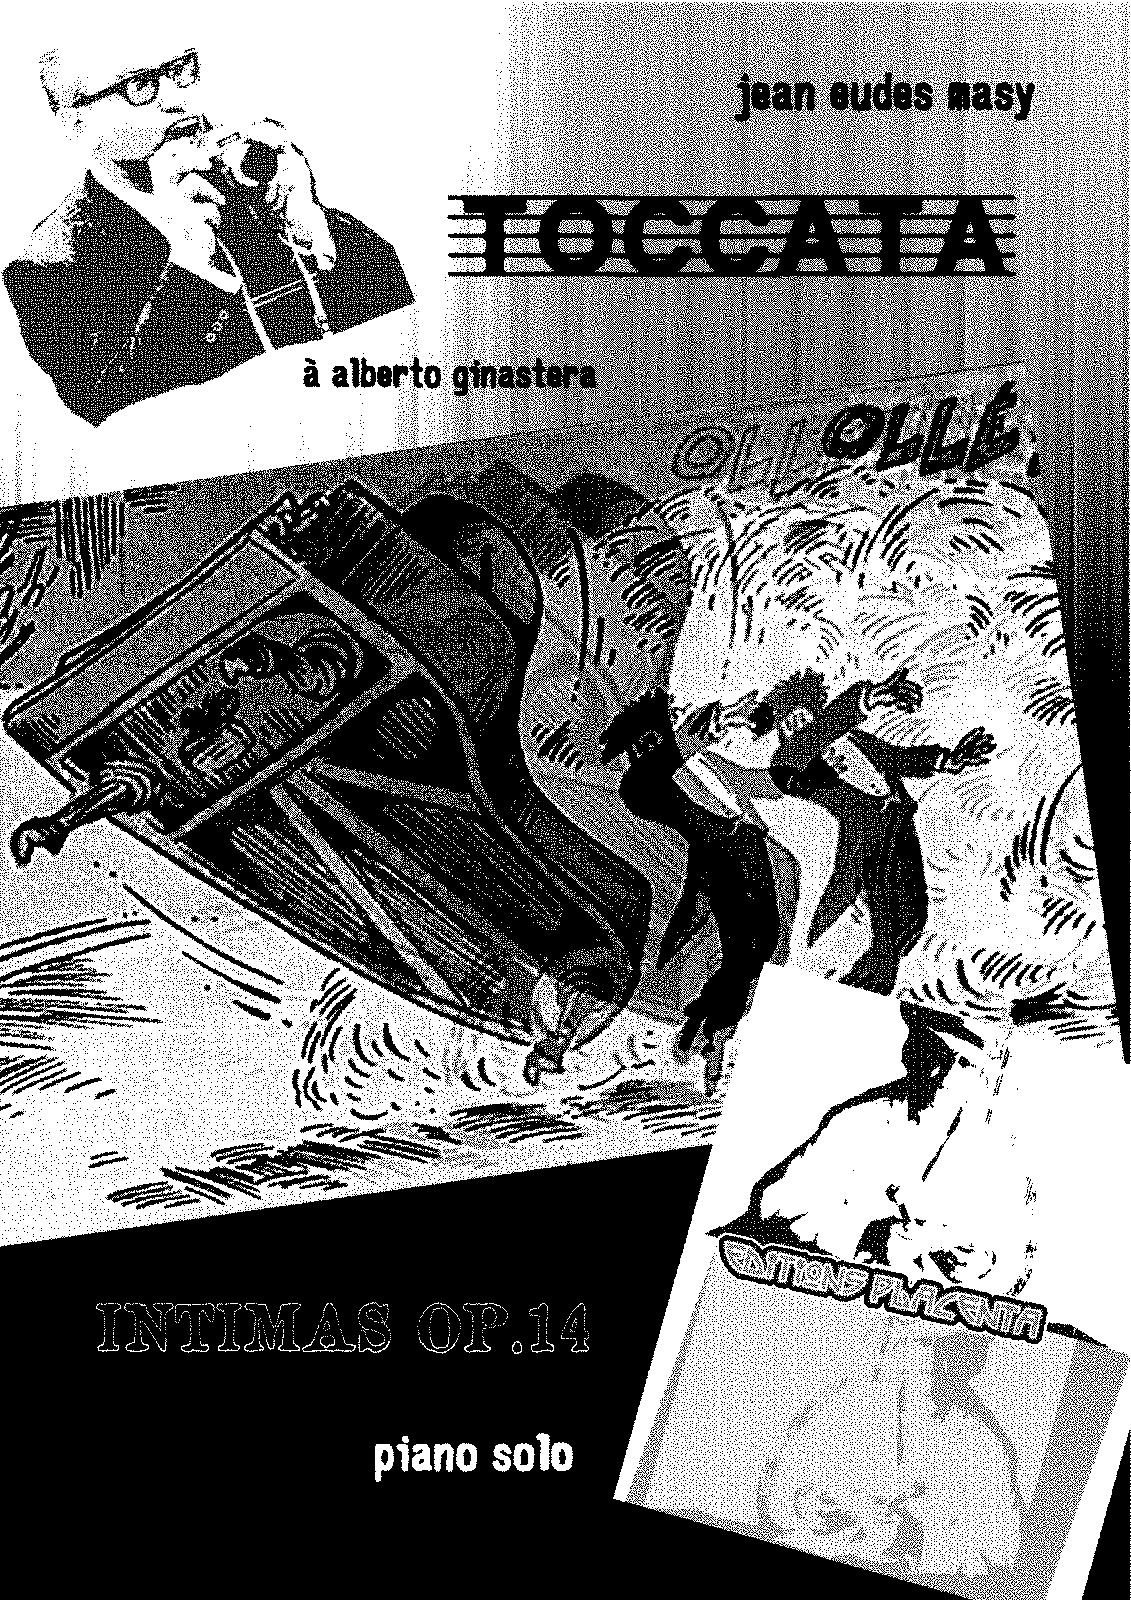 alberto ginastera op 2 pdf scribd